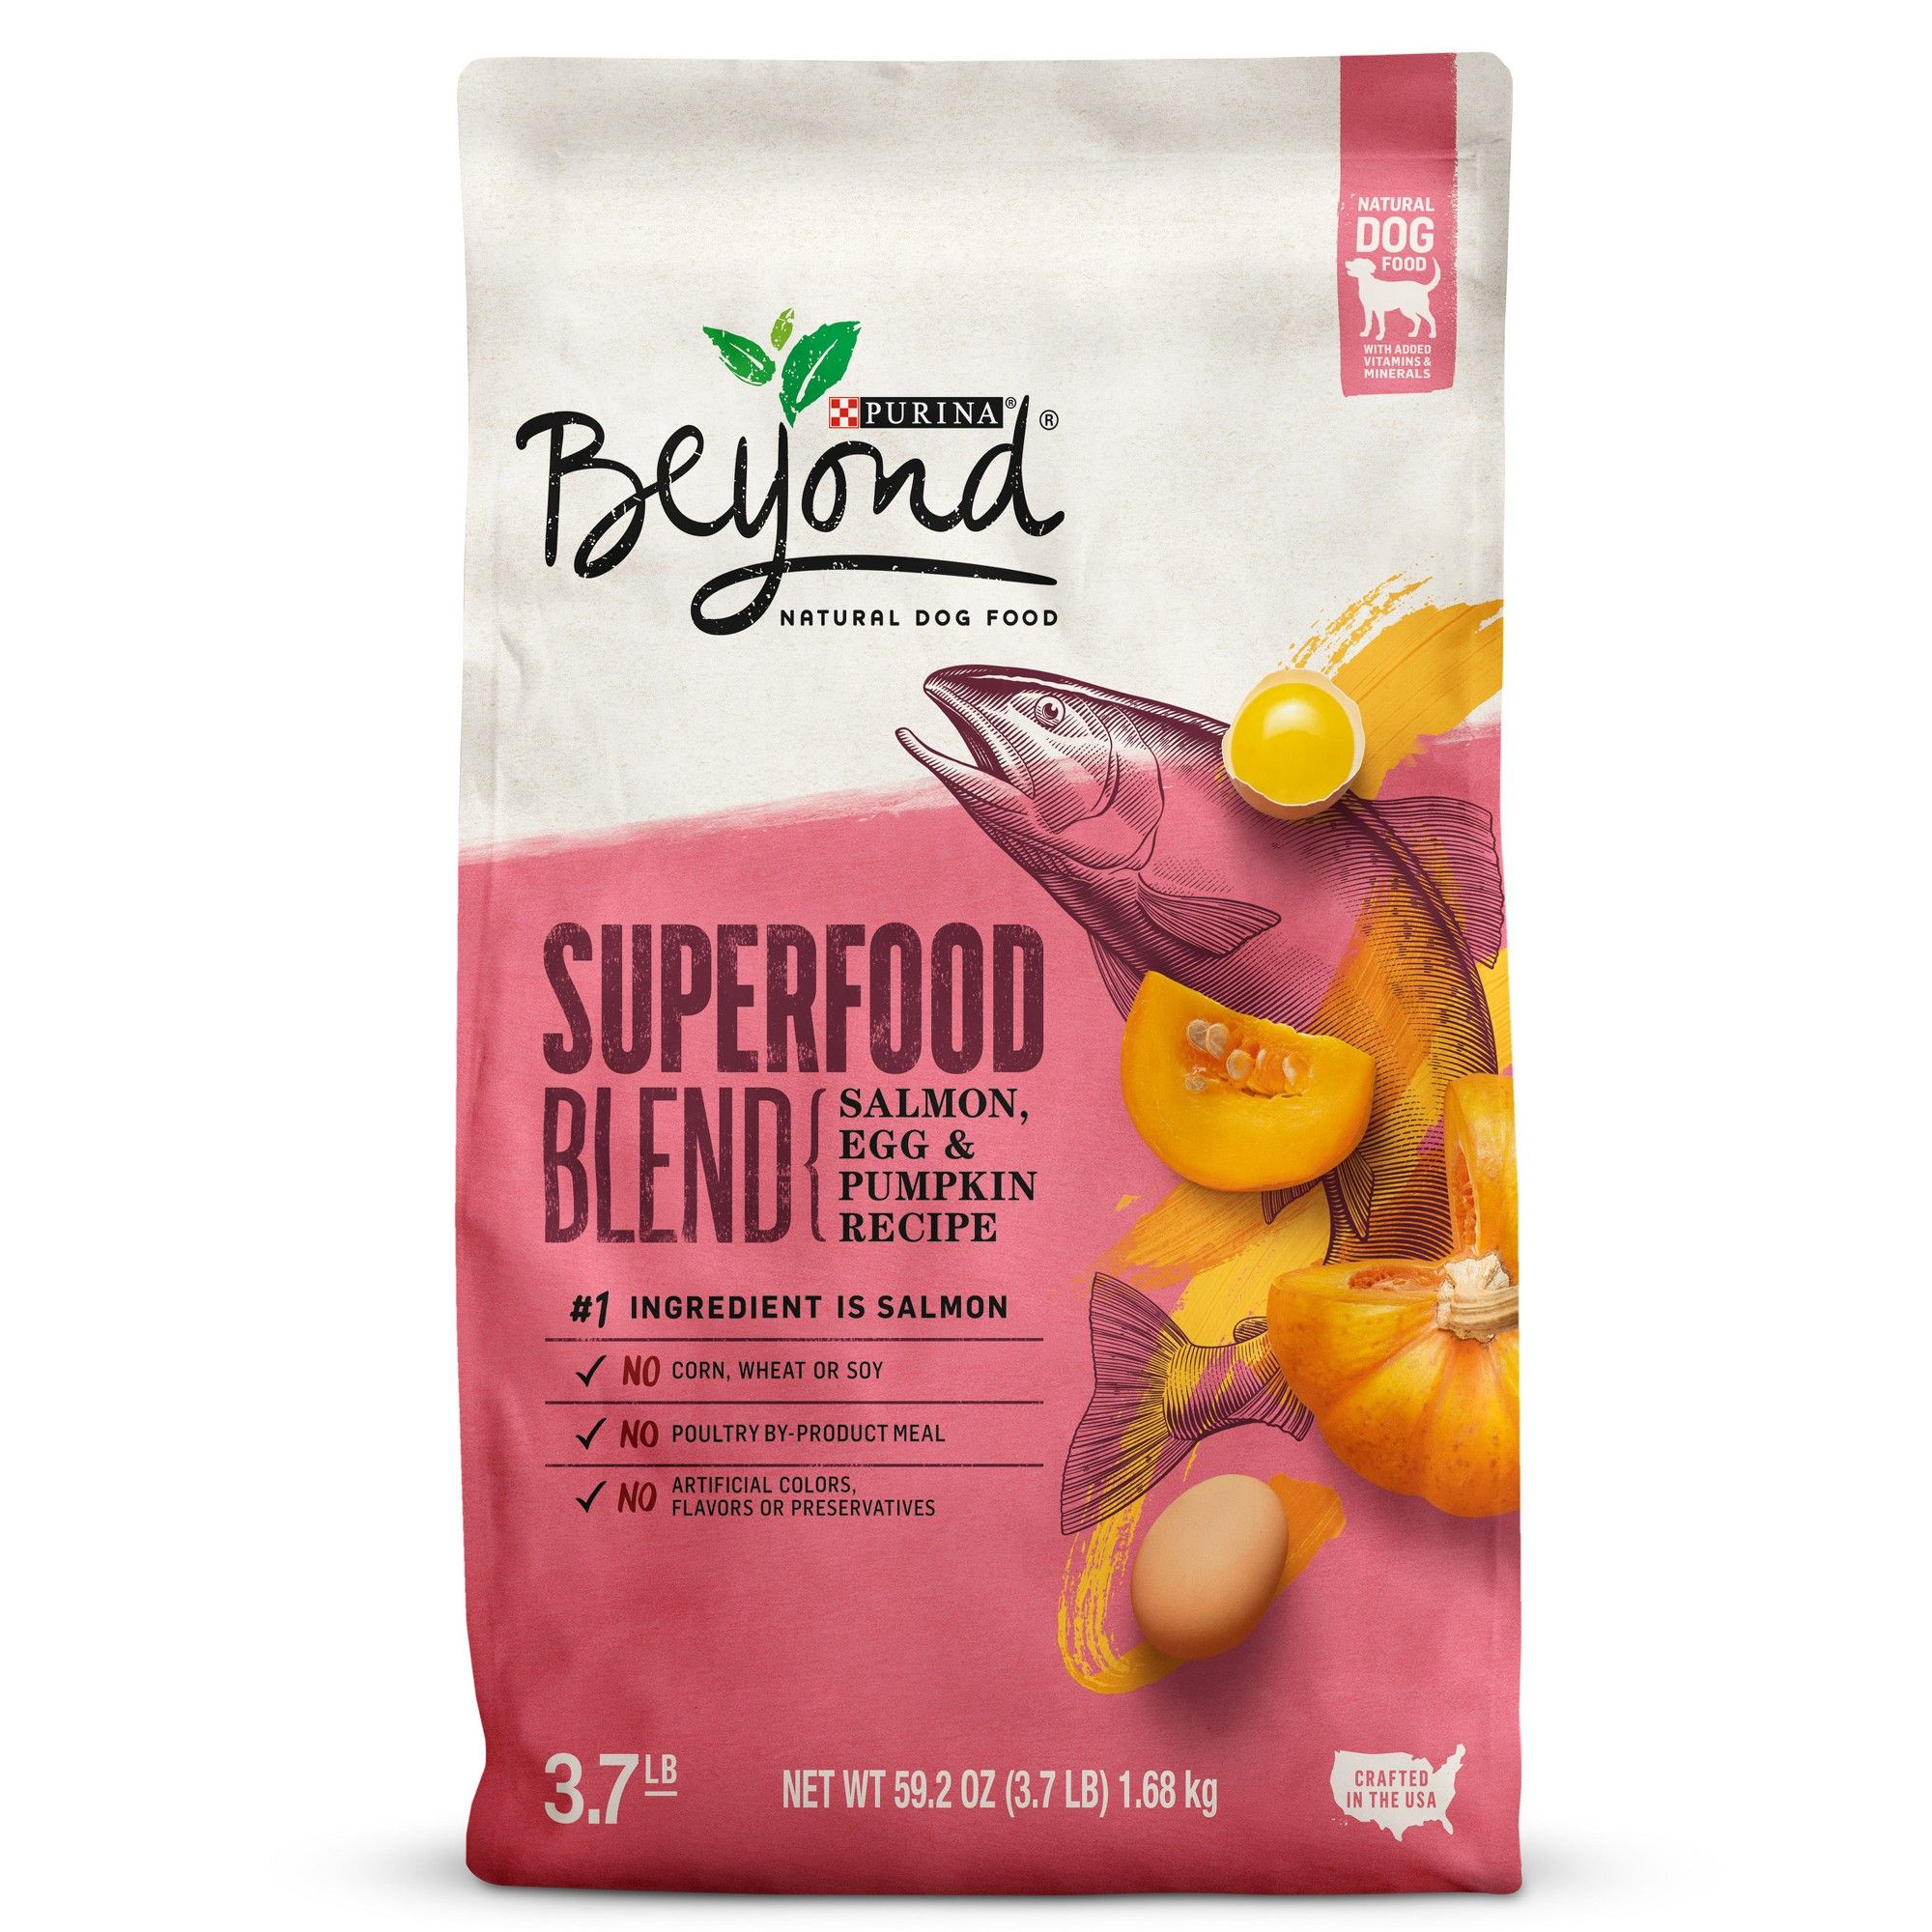 Purina Beyond Superfood Blend Salmon Egg And Pumpkin Recipe